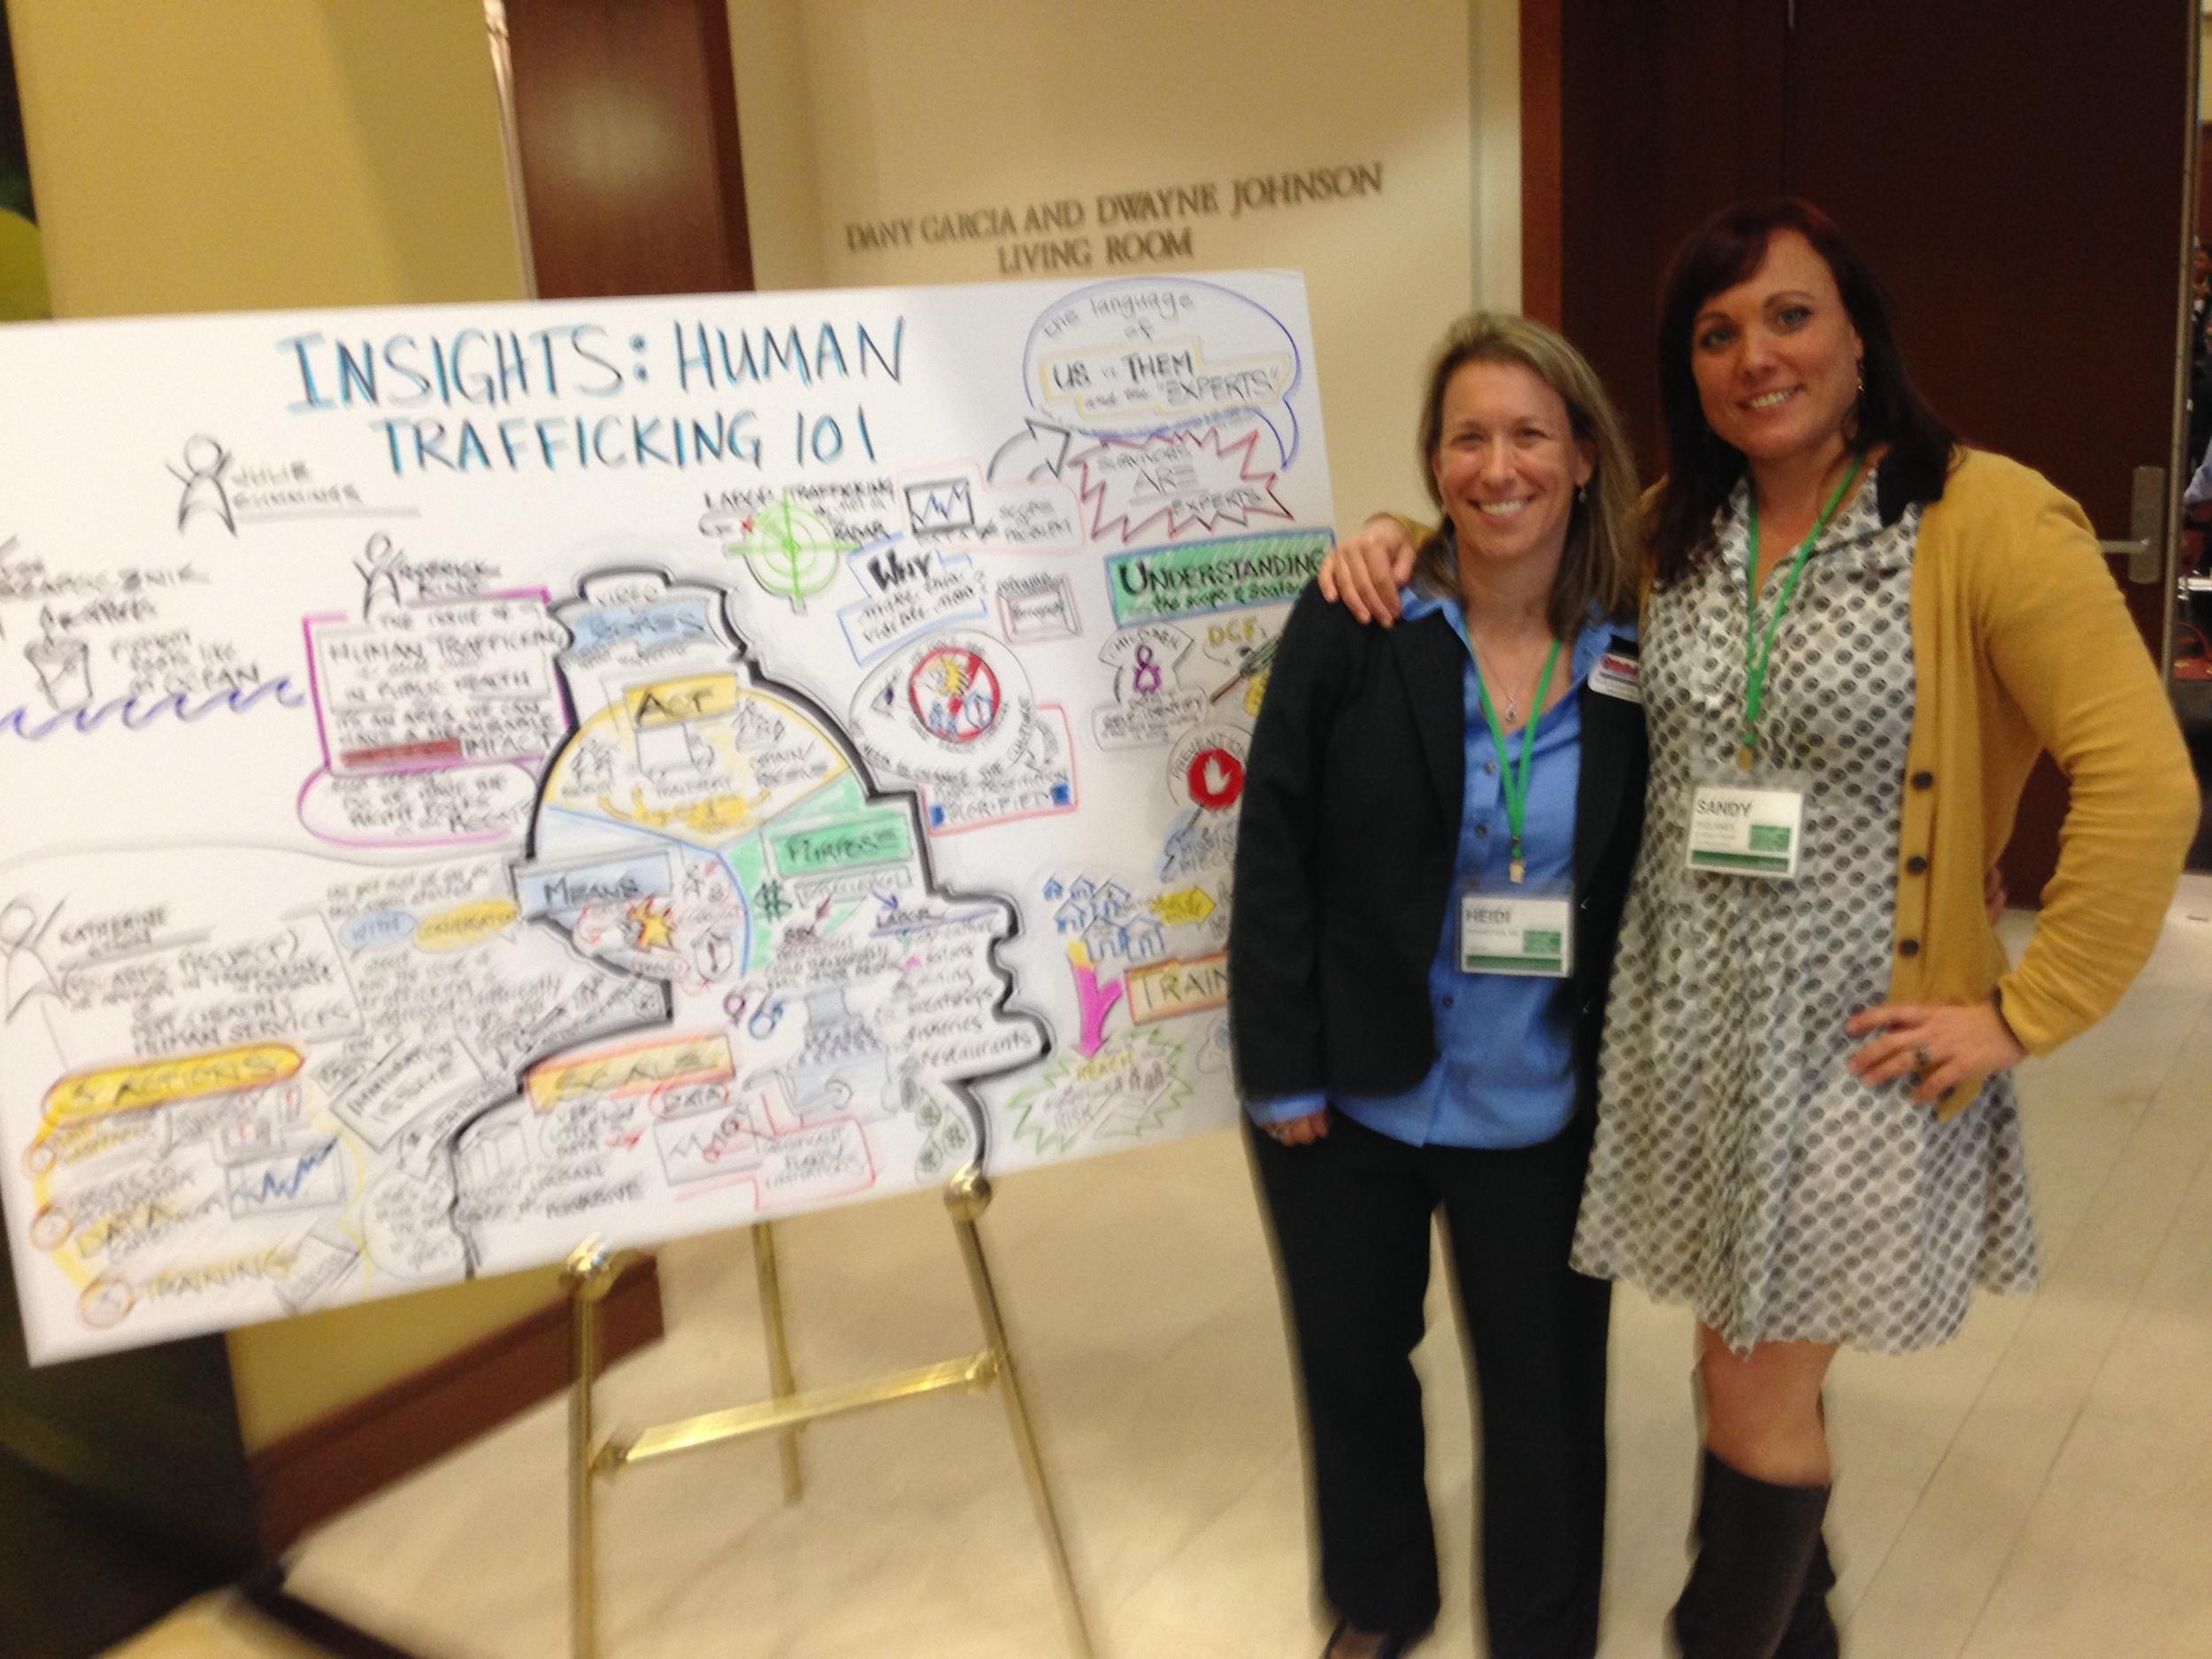 Heidi Schaefer Trafficking and Public Health